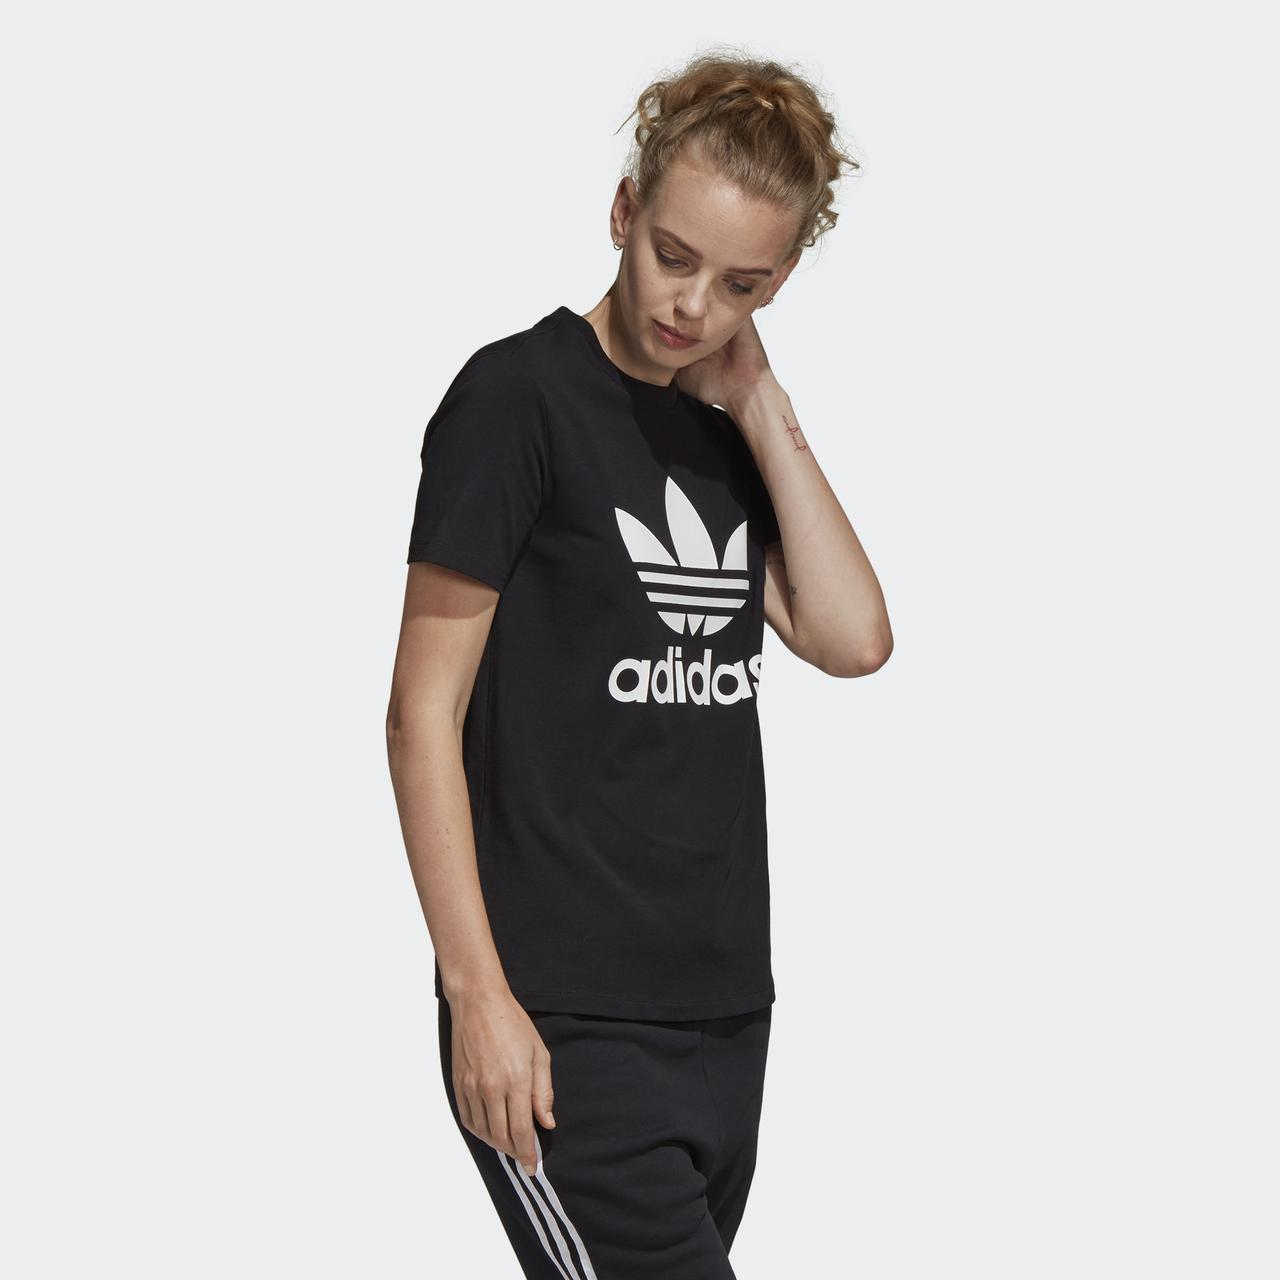 ac10e8ad Женская футболка Adidas Originals Trefoil Tee CV9888 - 2019: продажа ...